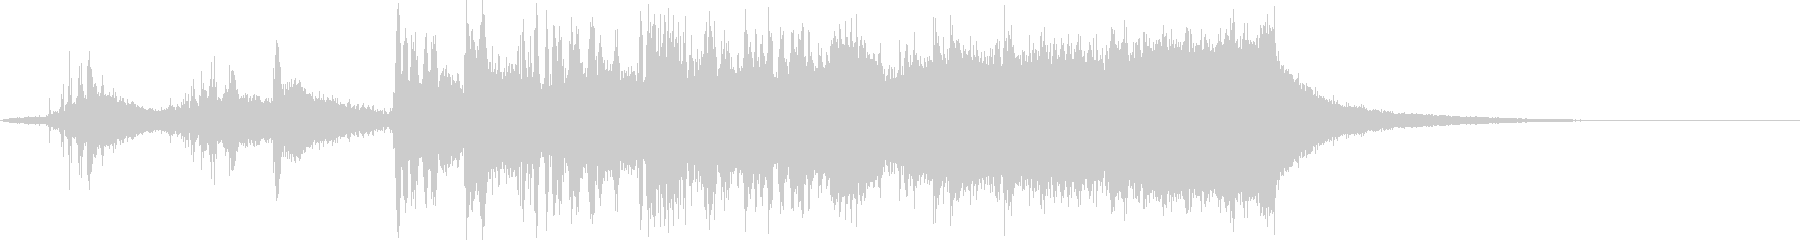 CINEMATIC RISER_35の未再生の波形